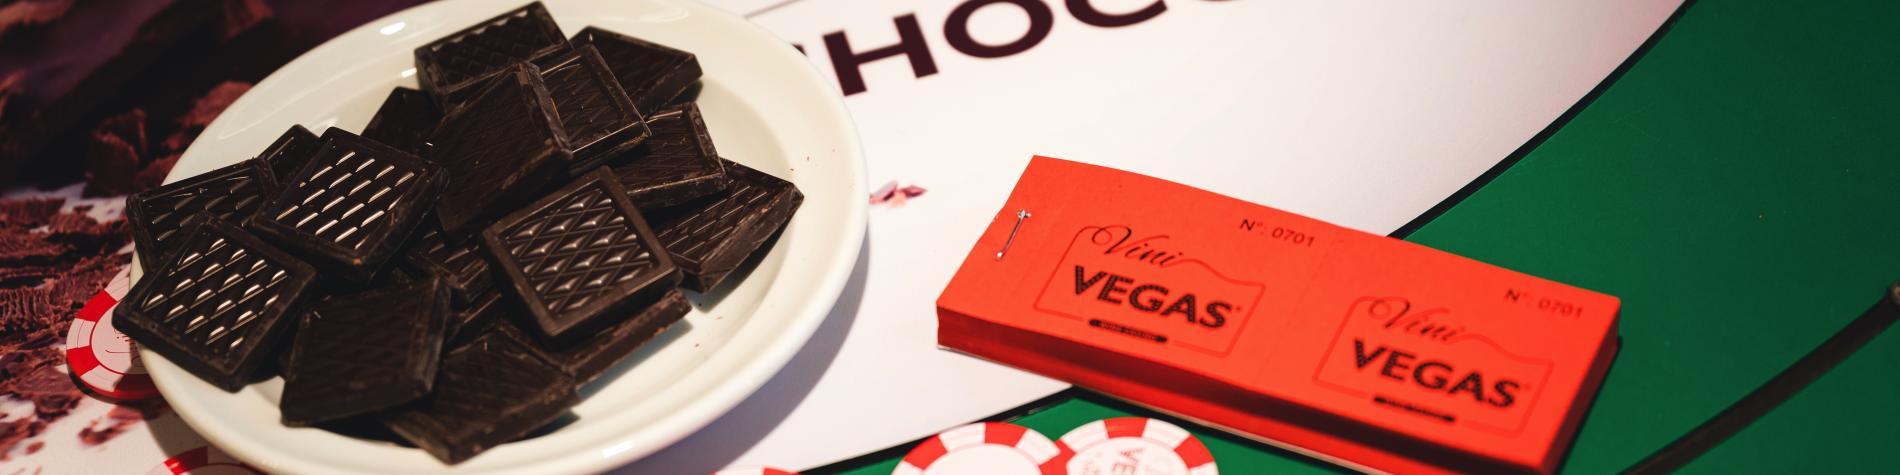 VINI VEGAS® Chocolat - Cinéréa Benelux